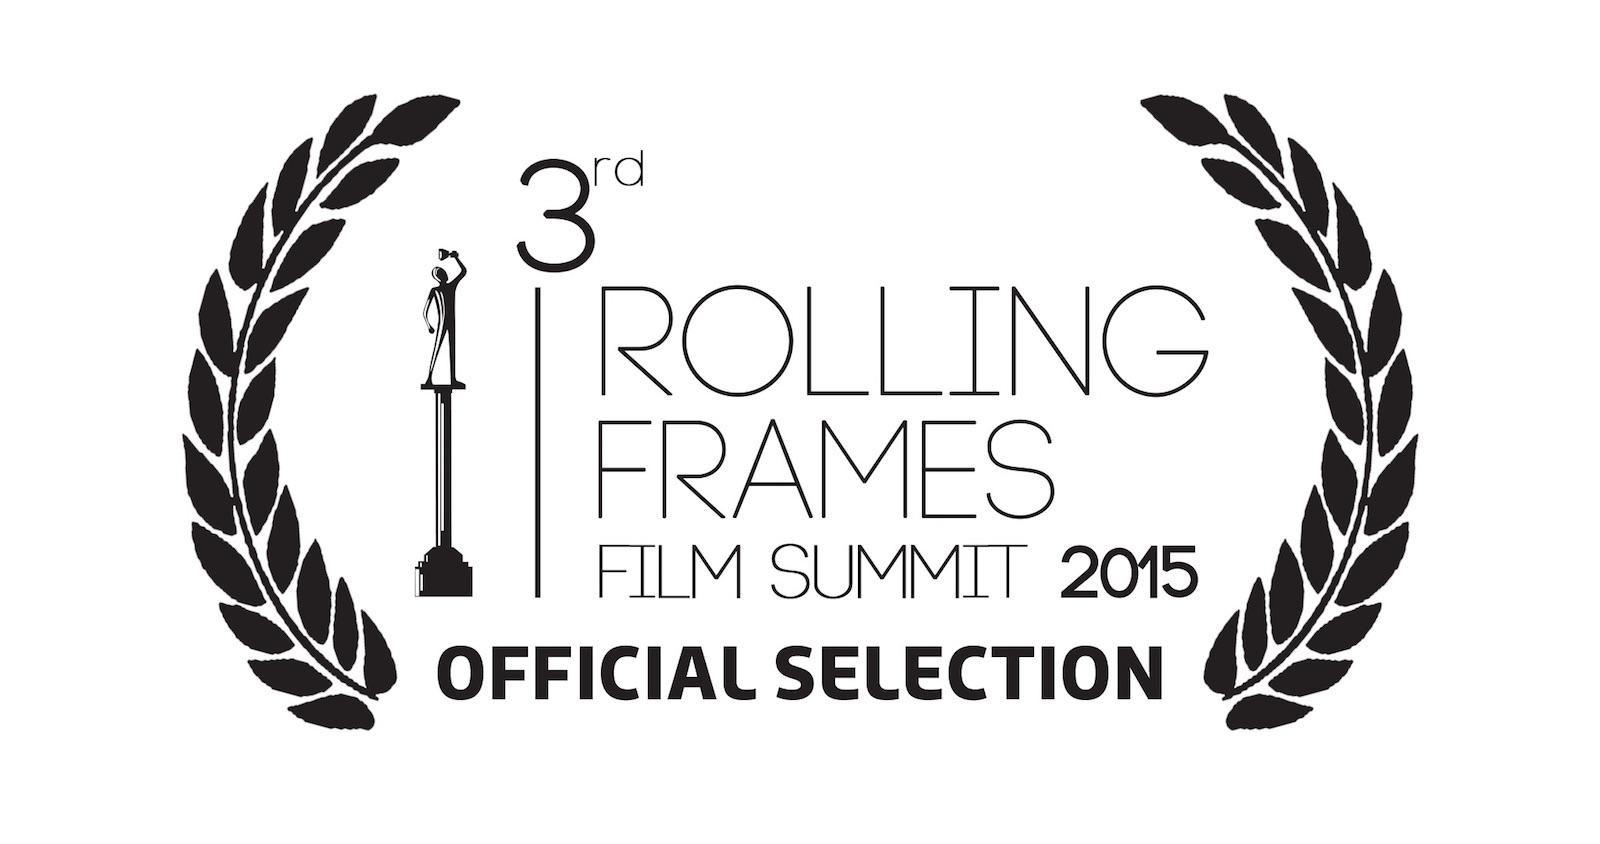 Rolling-frames-2015-official-Selection-Logo_Web